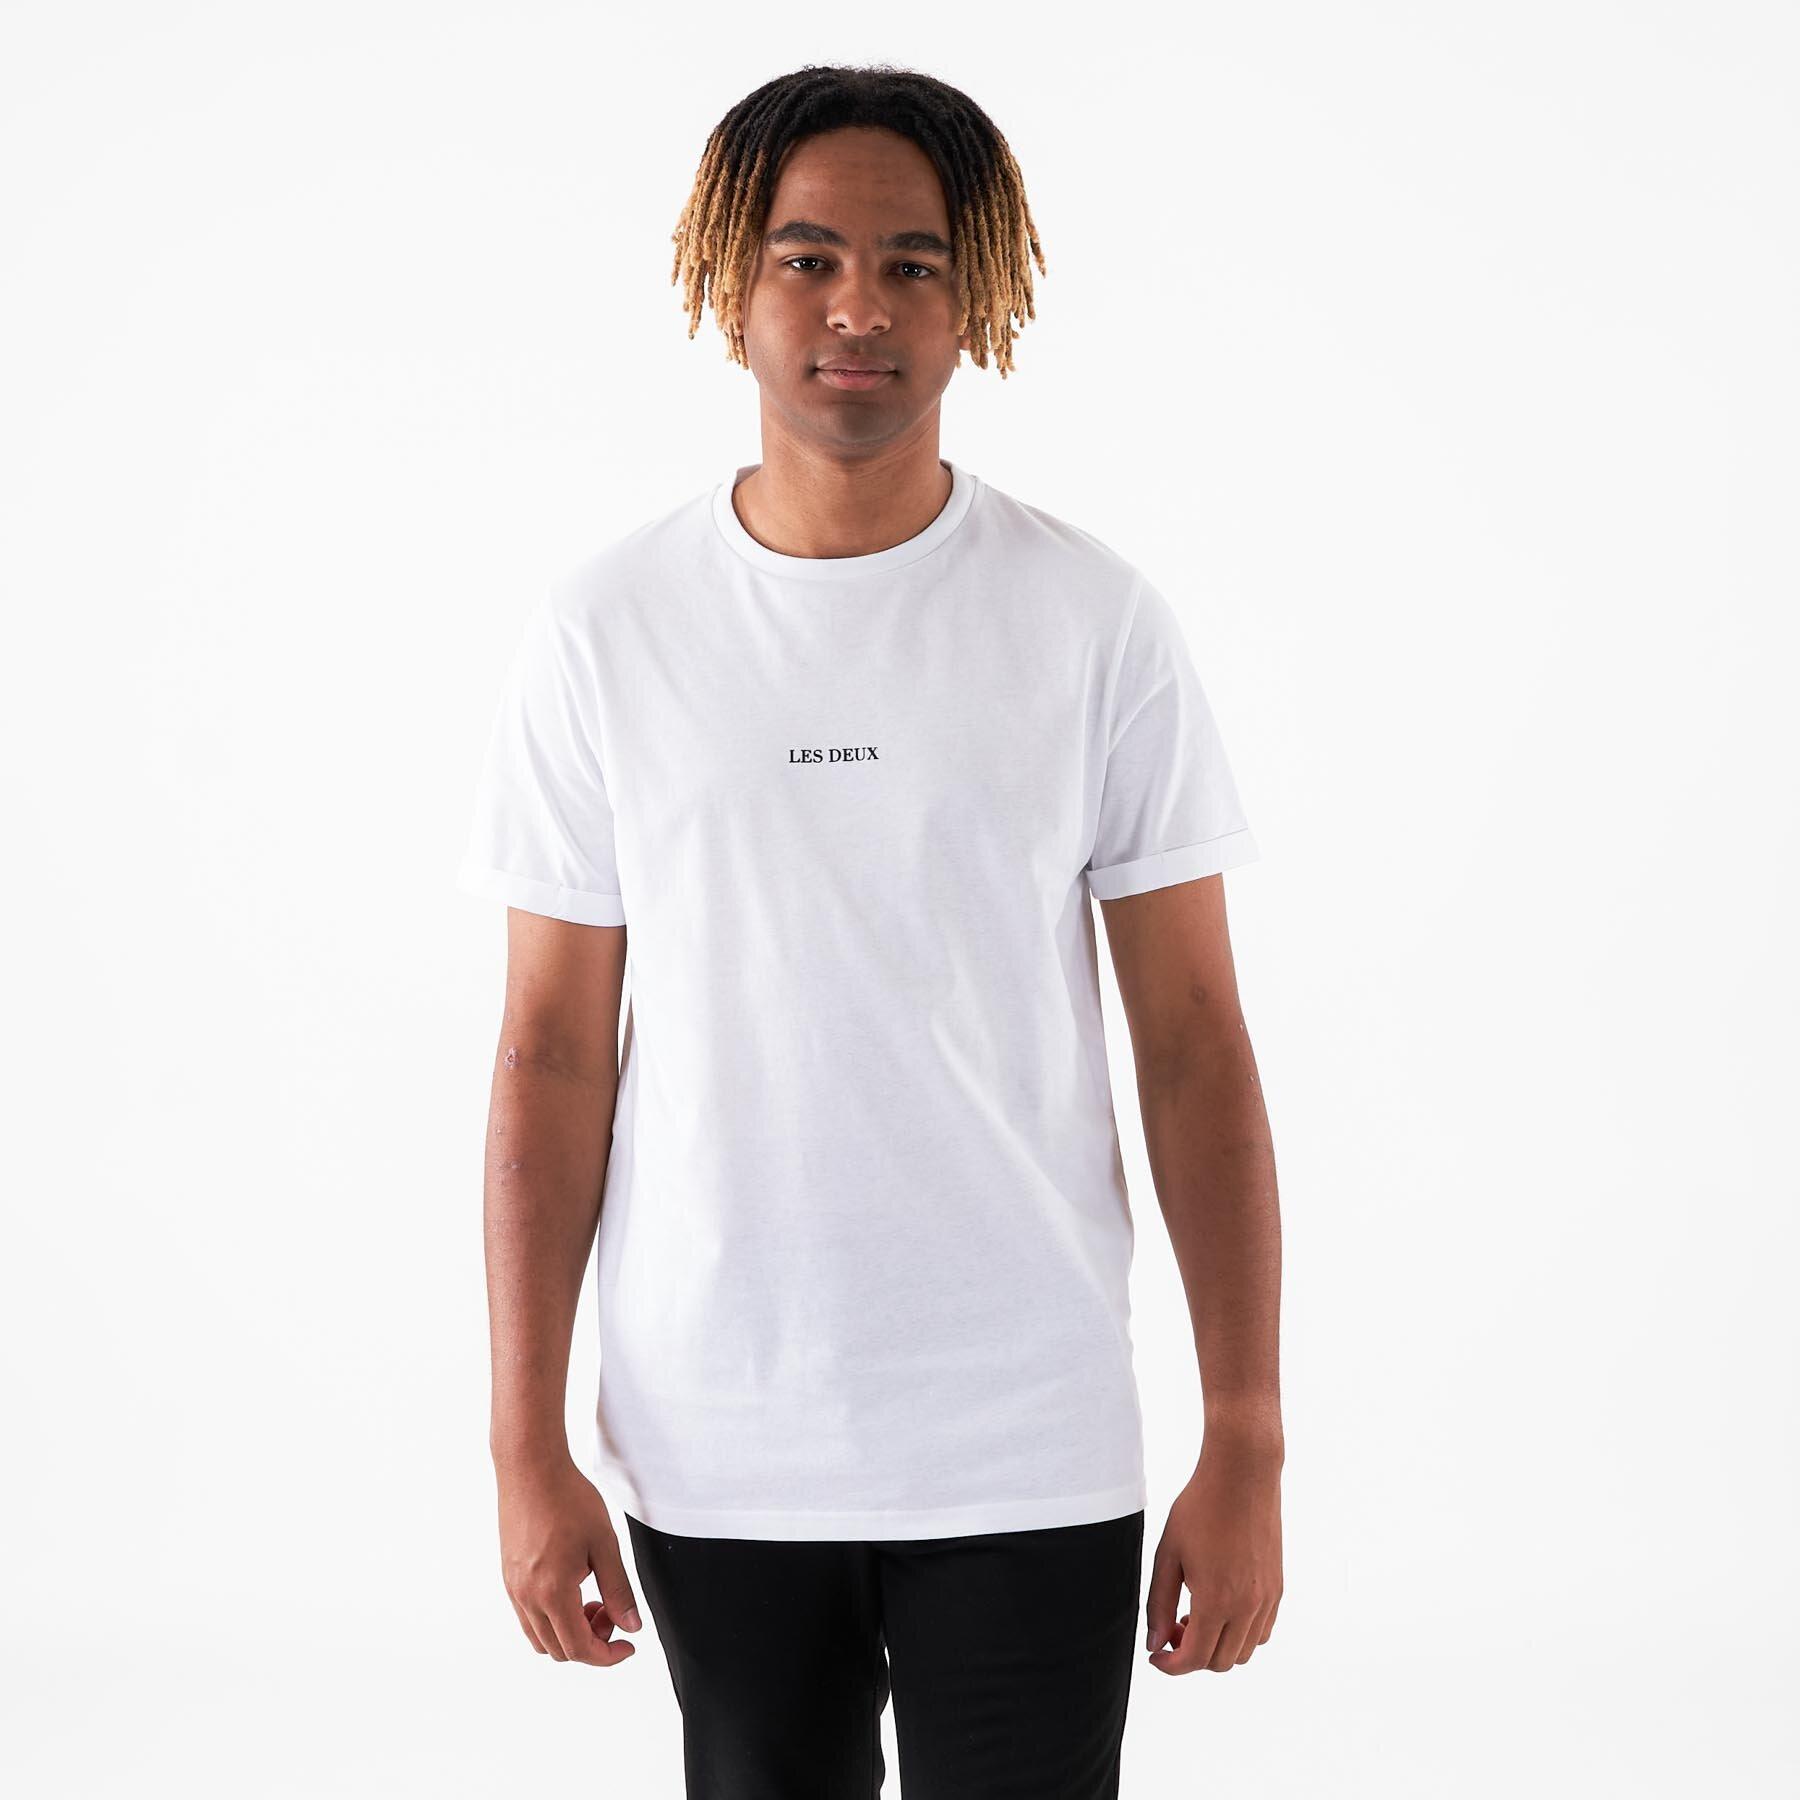 Les Deux - Lens T-Shirt - T-shirts til mænd - 201100-WHITE/BLACK - S